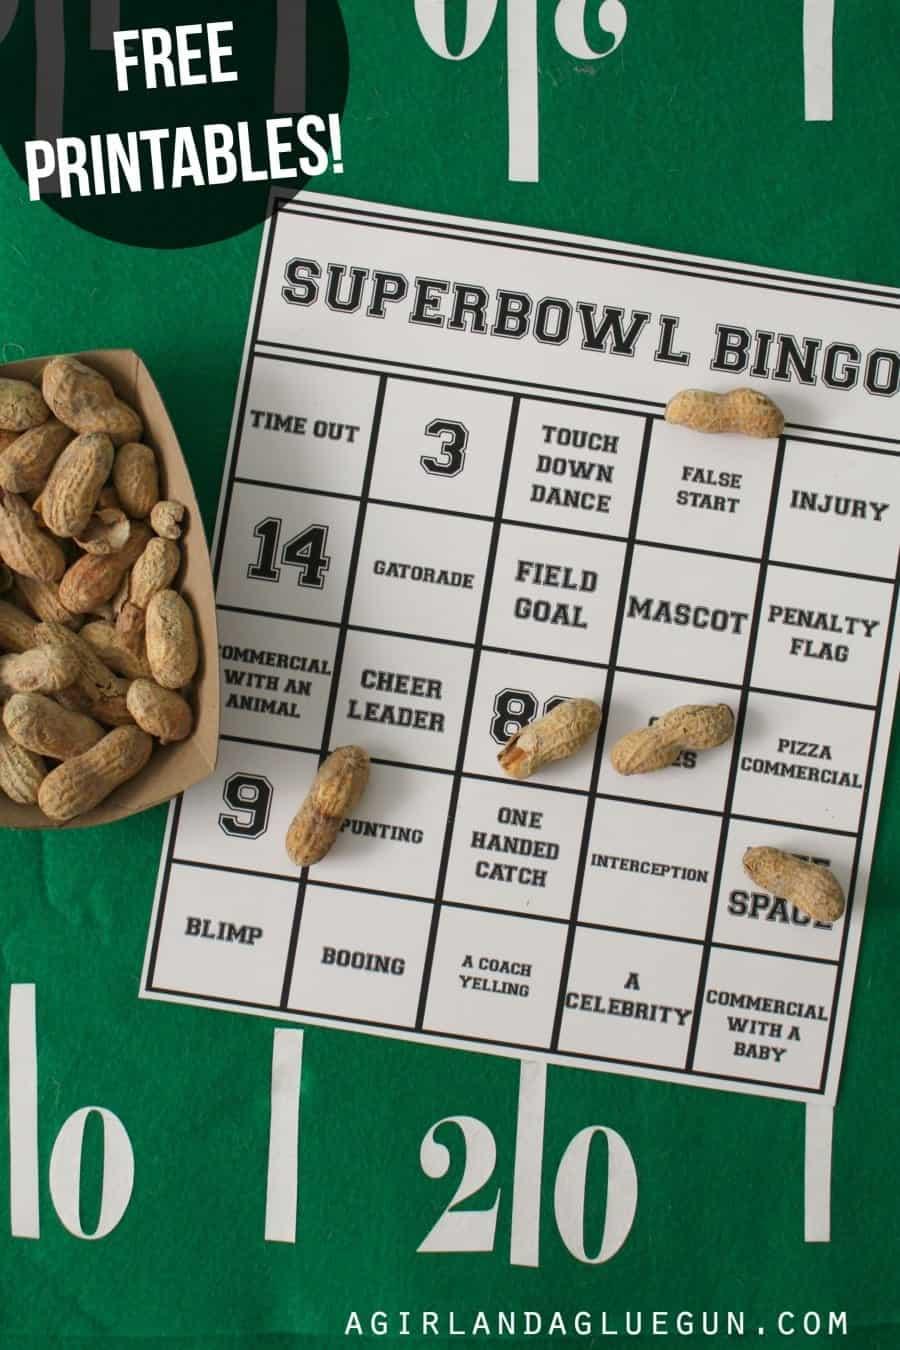 superbowl bingo 15 free printables